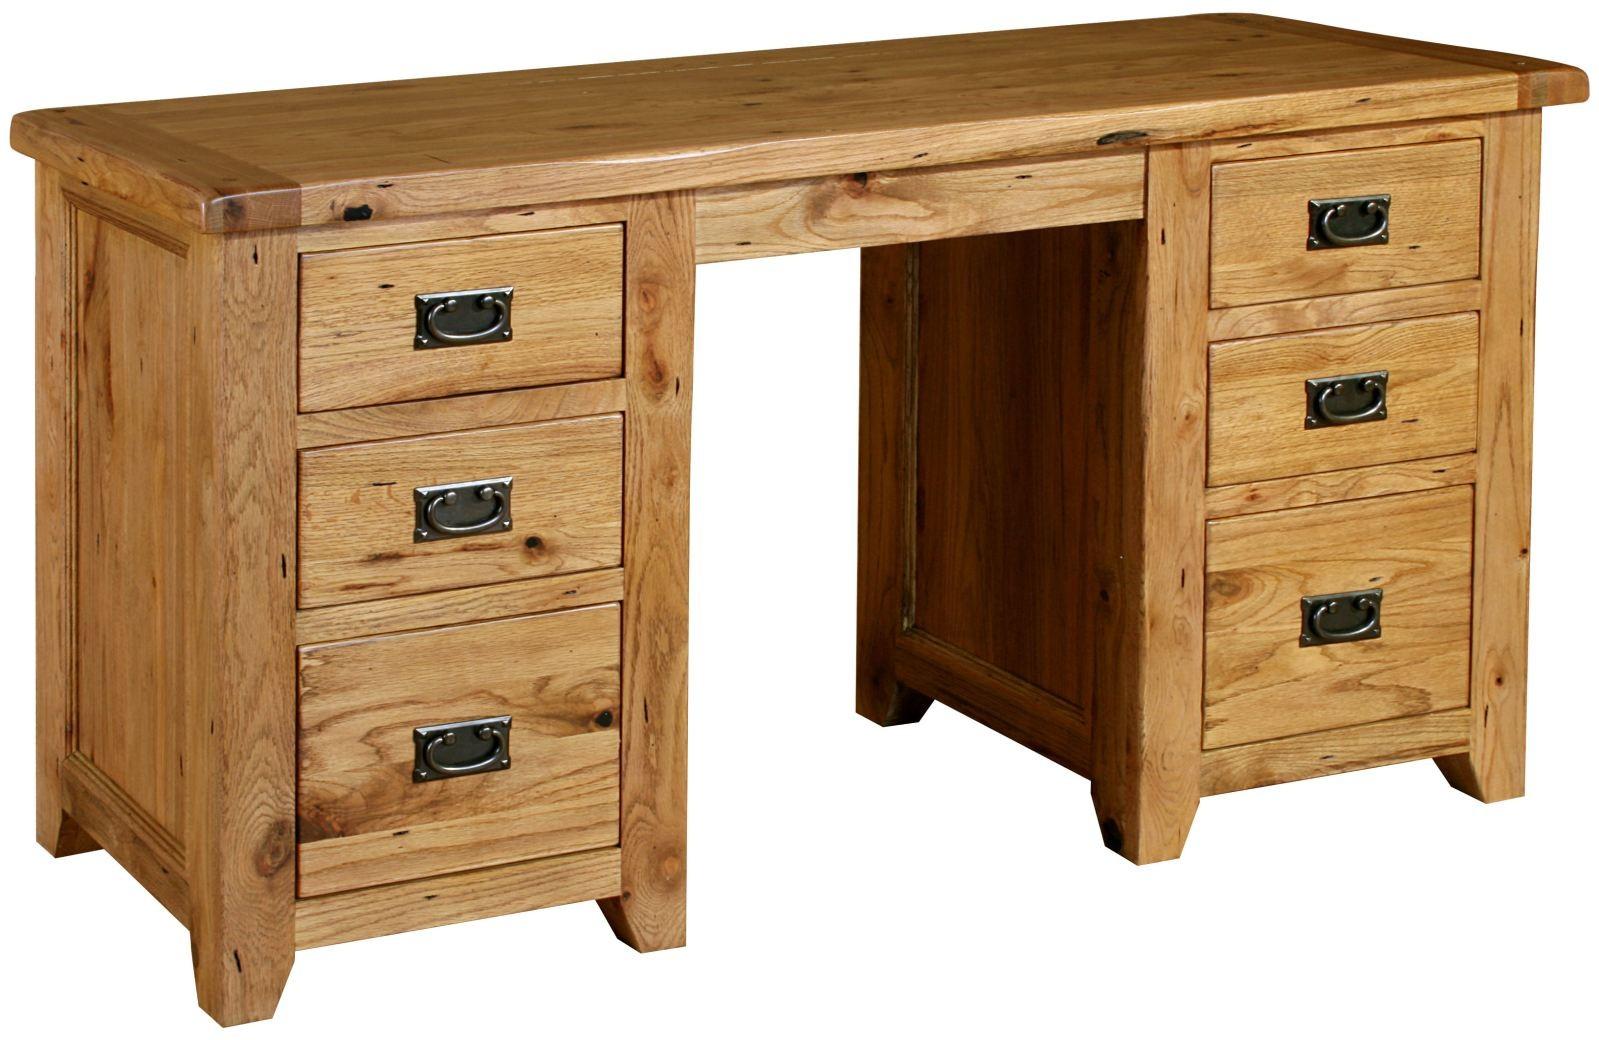 Bordeaux Rustic Oak Double Dressing Table Birch Commercial - Rustic oak dressing table